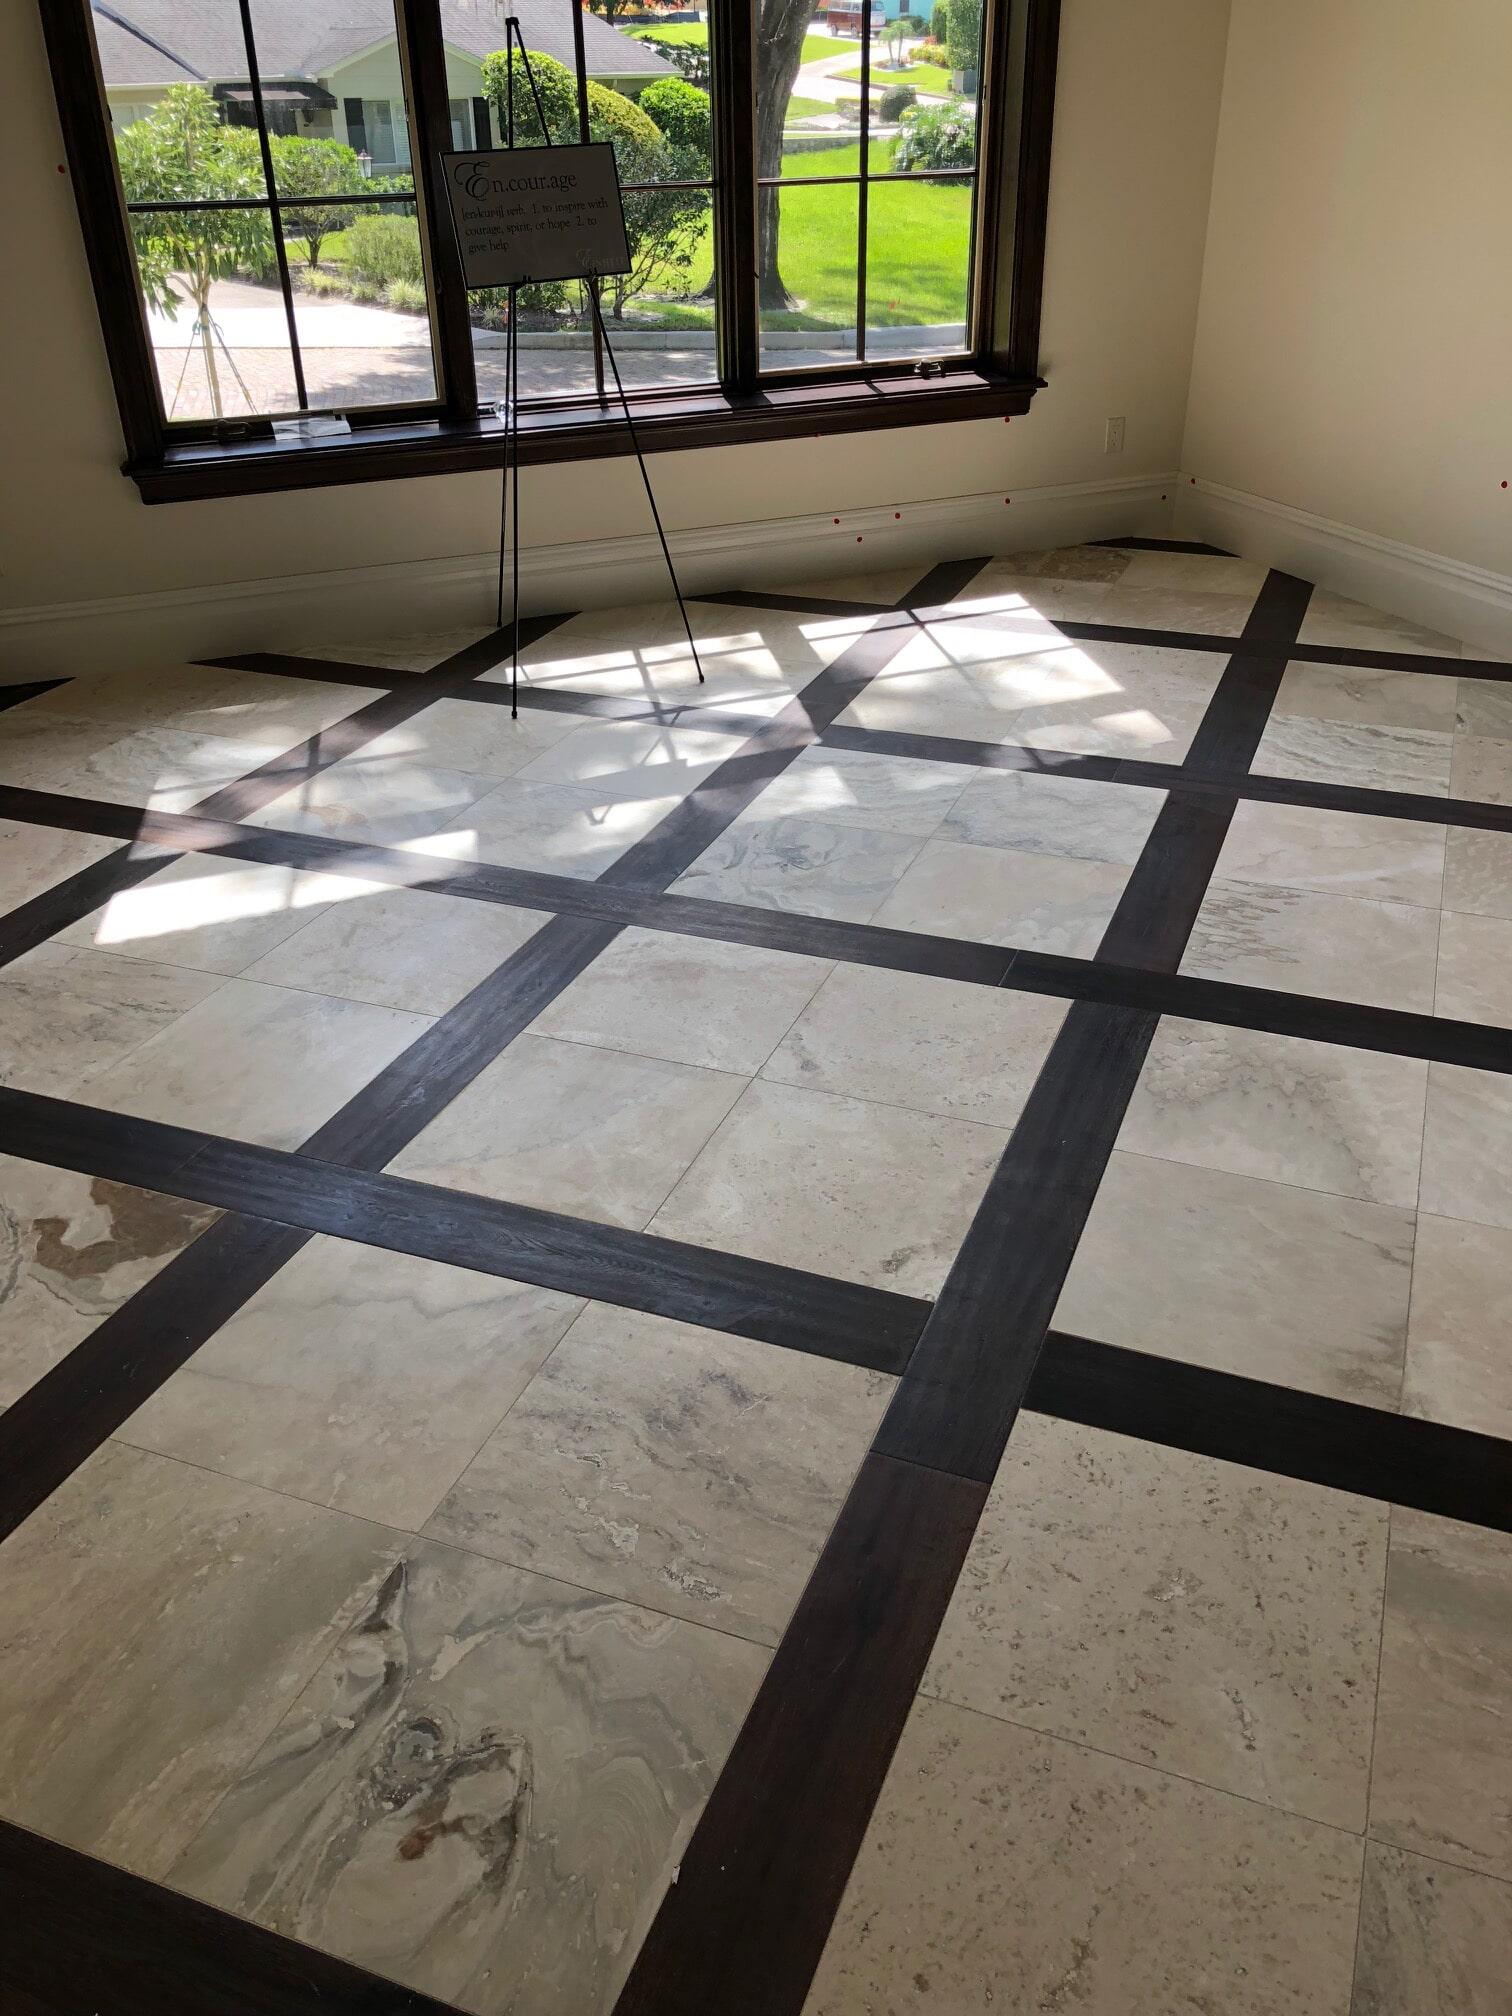 Tile flooring from The Flooring Center in Orlando, FL